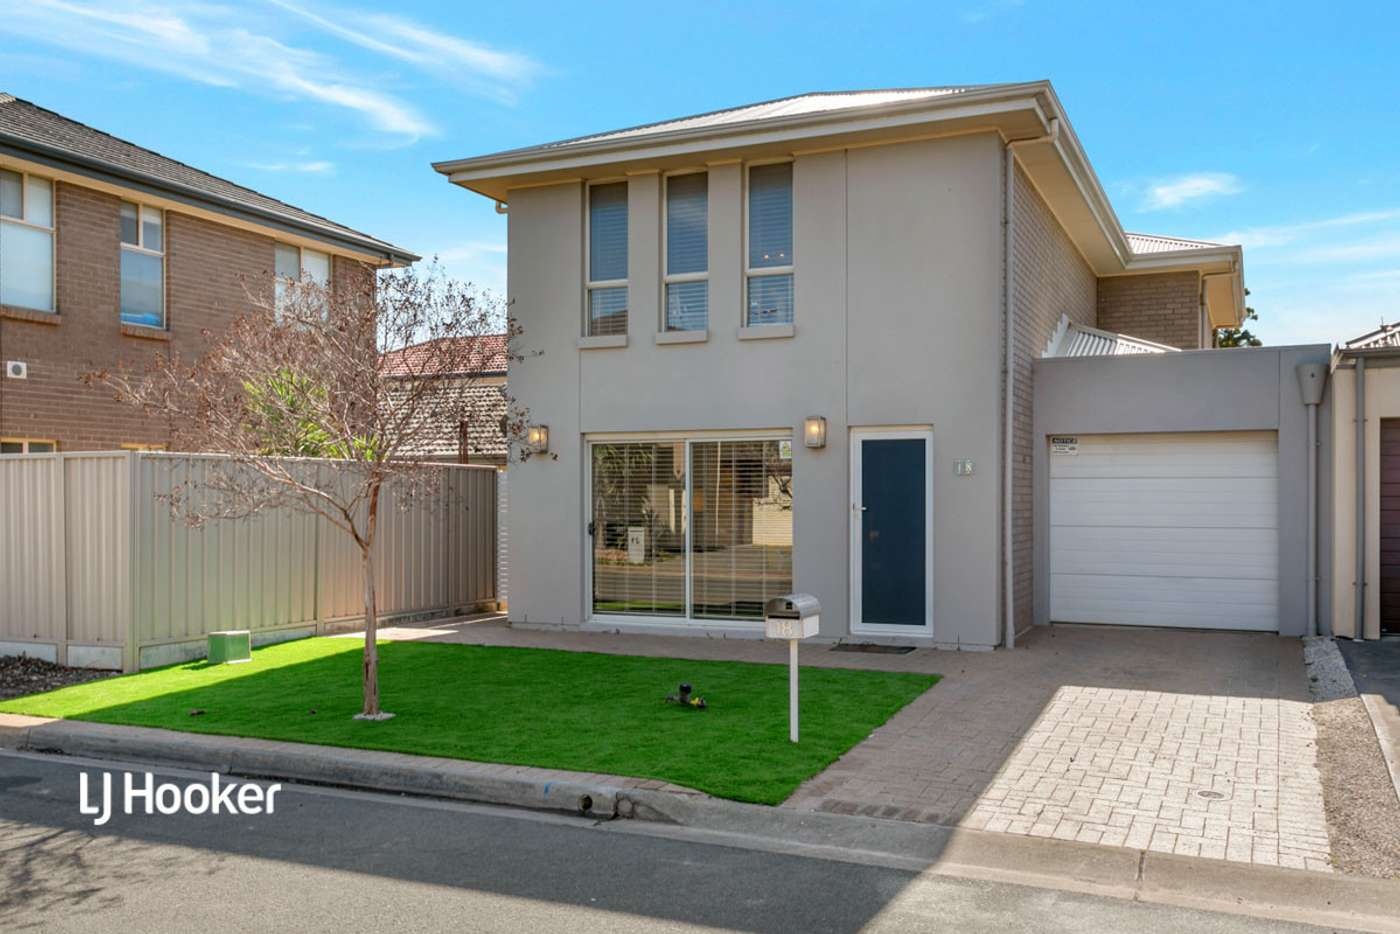 Main view of Homely house listing, 18 William Langman Circuit, Ridleyton SA 5008